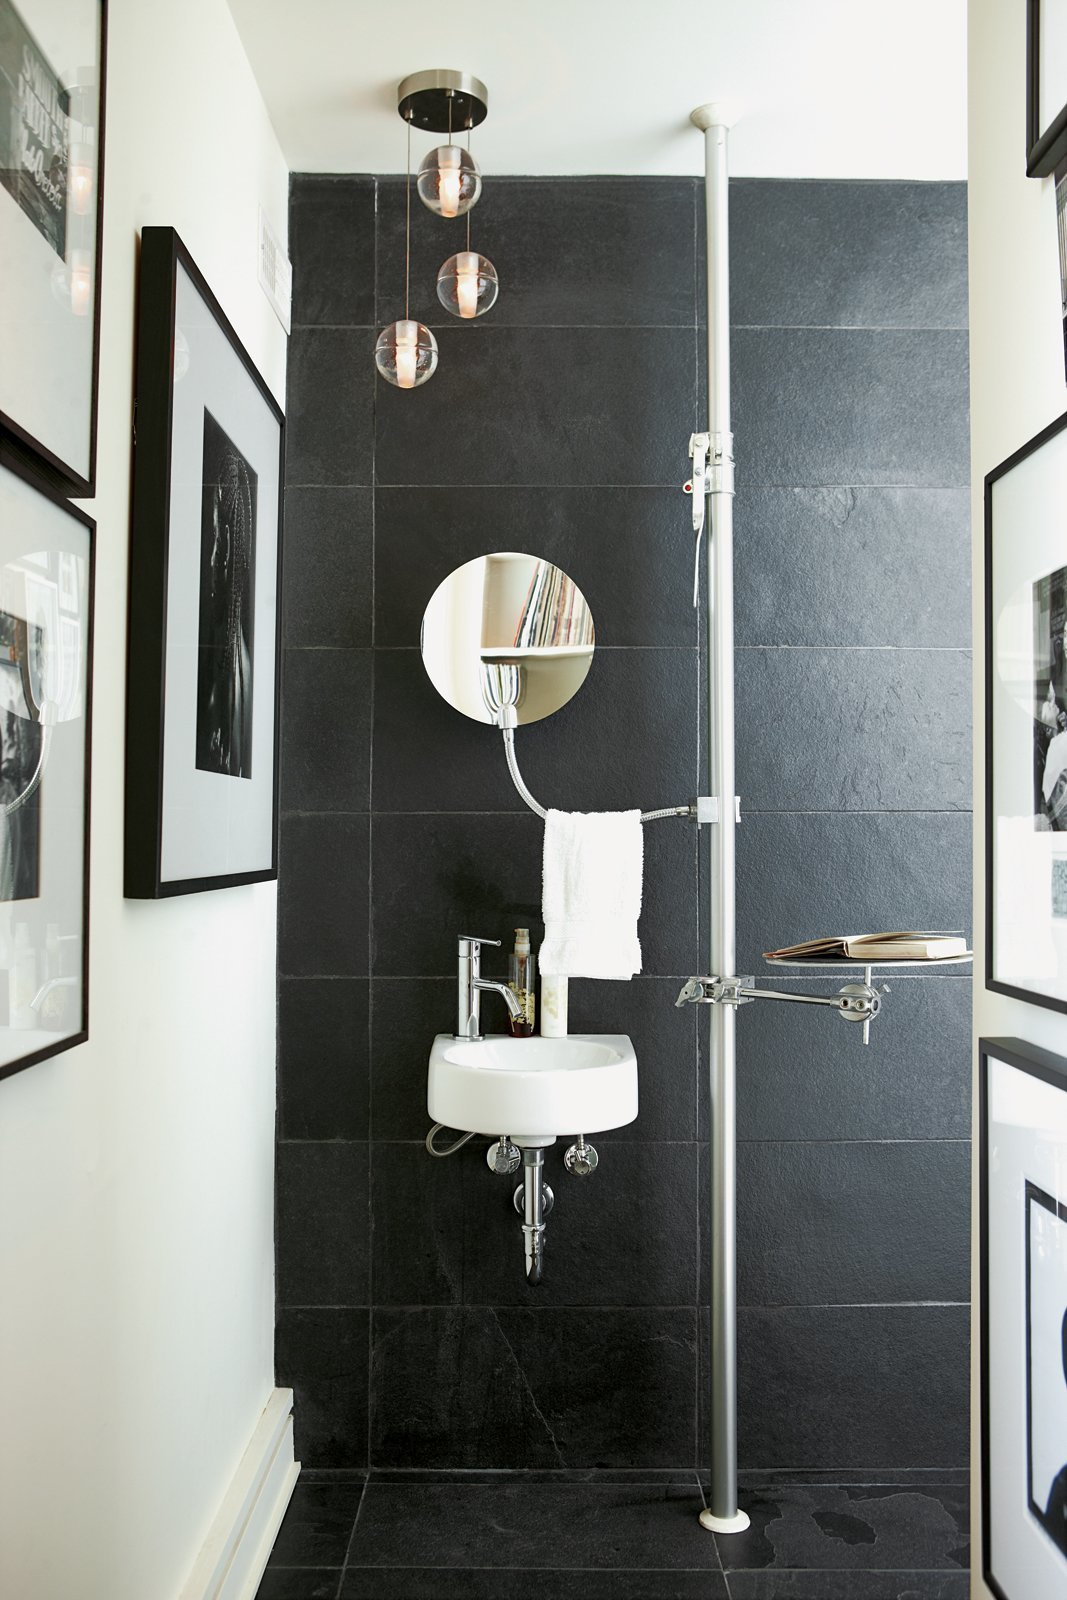 astuce rangement petite salle de bain design et pratique !. meuble ... - Rangement Pratique Salle De Bain